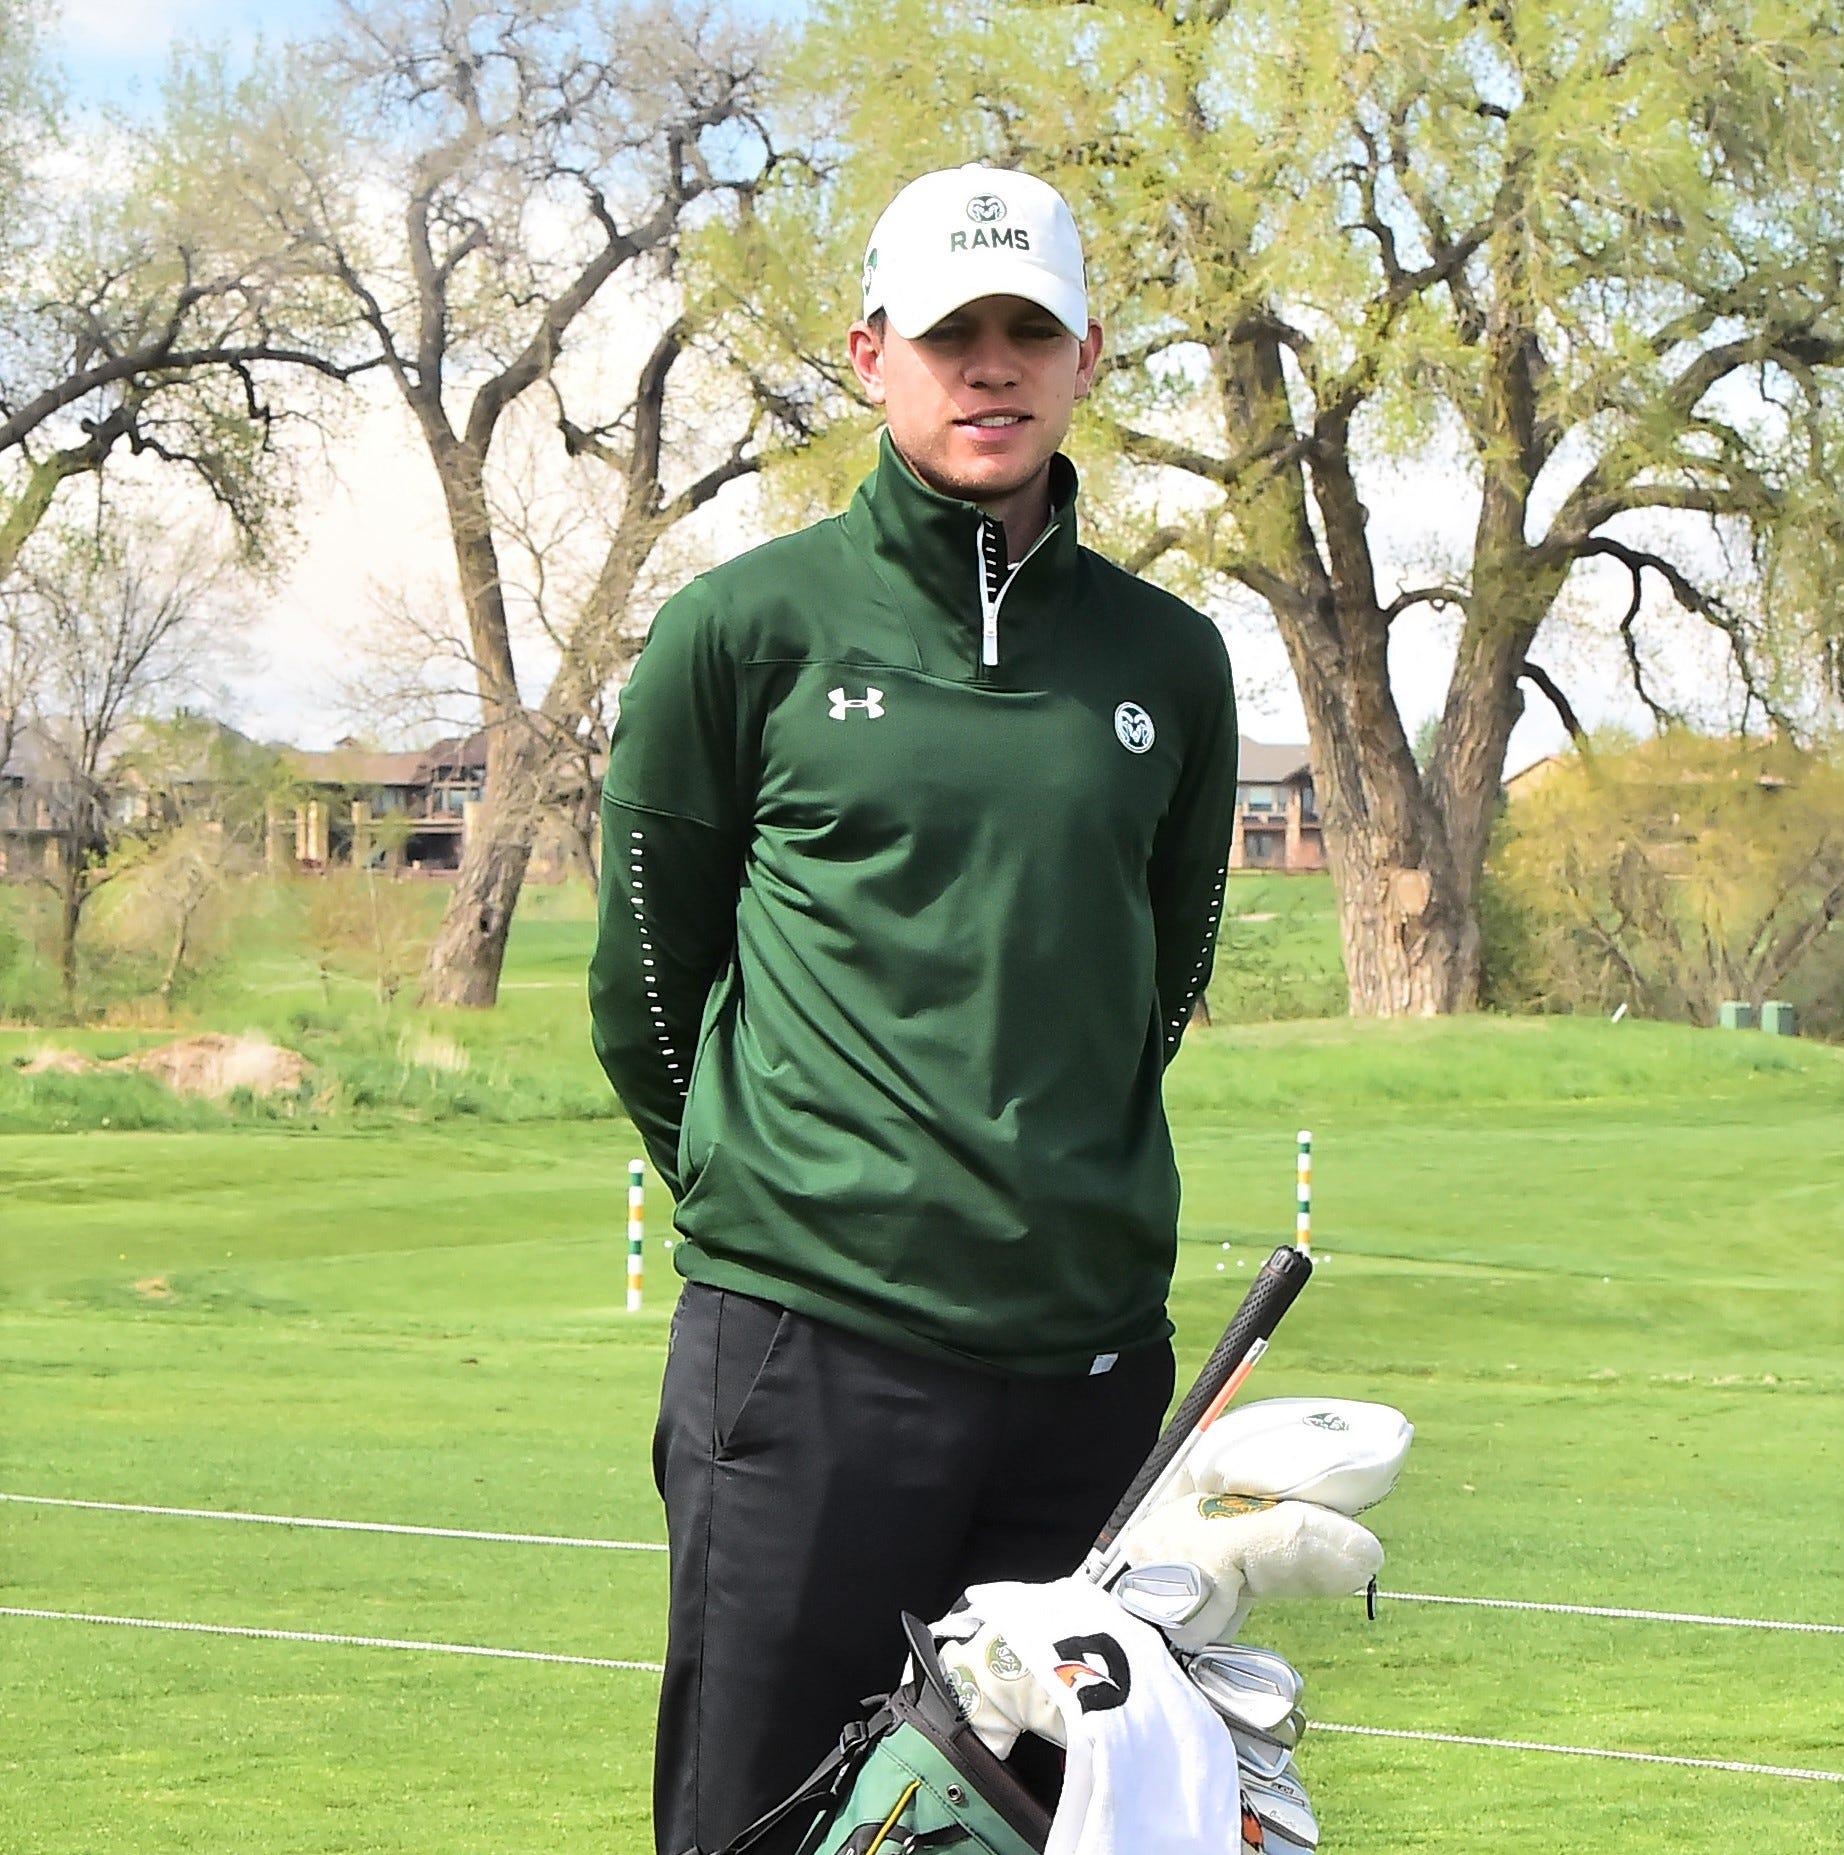 Fort Collins native A.J. Ott to carry CSU golf team's veteran memorial bag at NCAA Regional